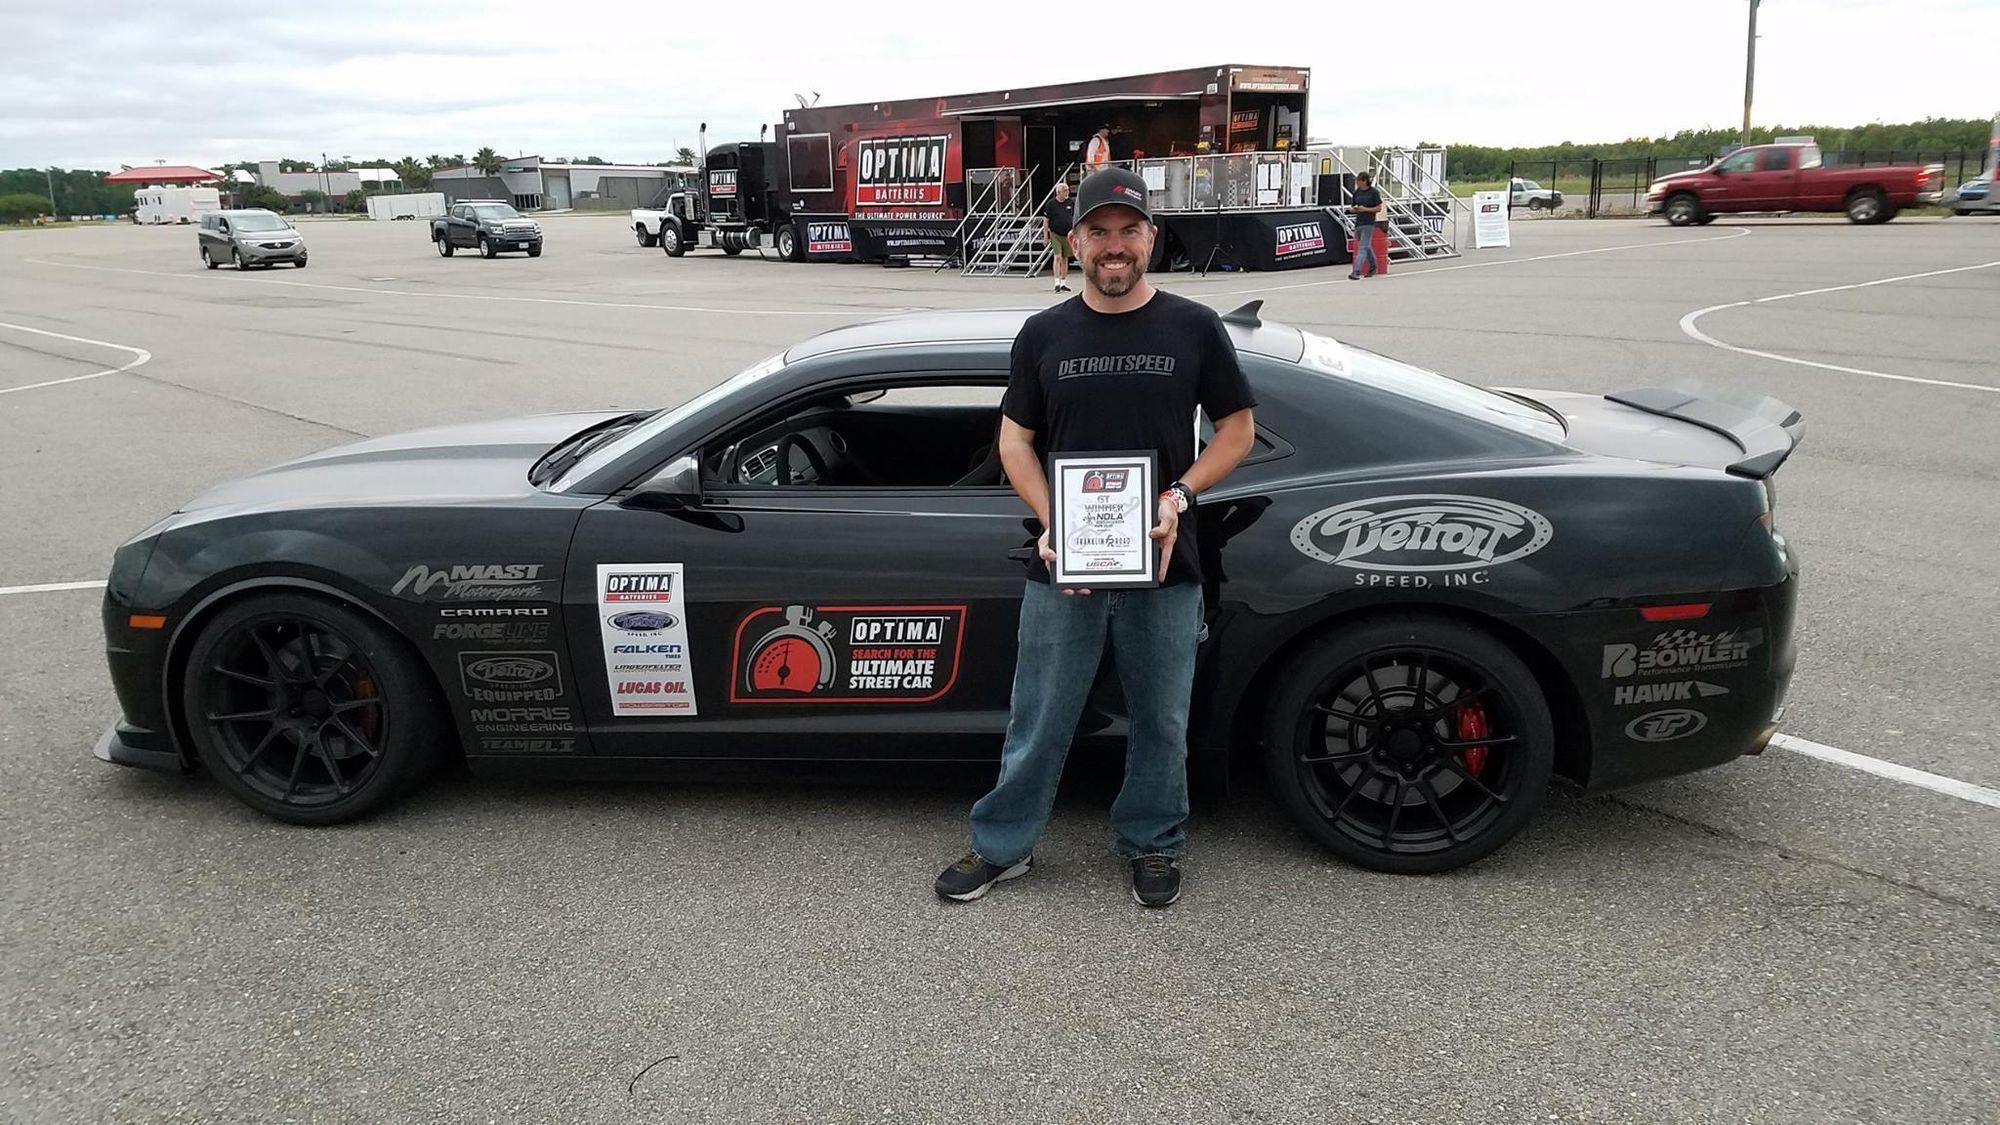 2013 Chevrolet Camaro | Bryan Johnson Wins GT Class at USCA NOLA with 5th Gen Camaro on Forgeline One Piece Forged Monoblock GA1R Open Lug Wheels